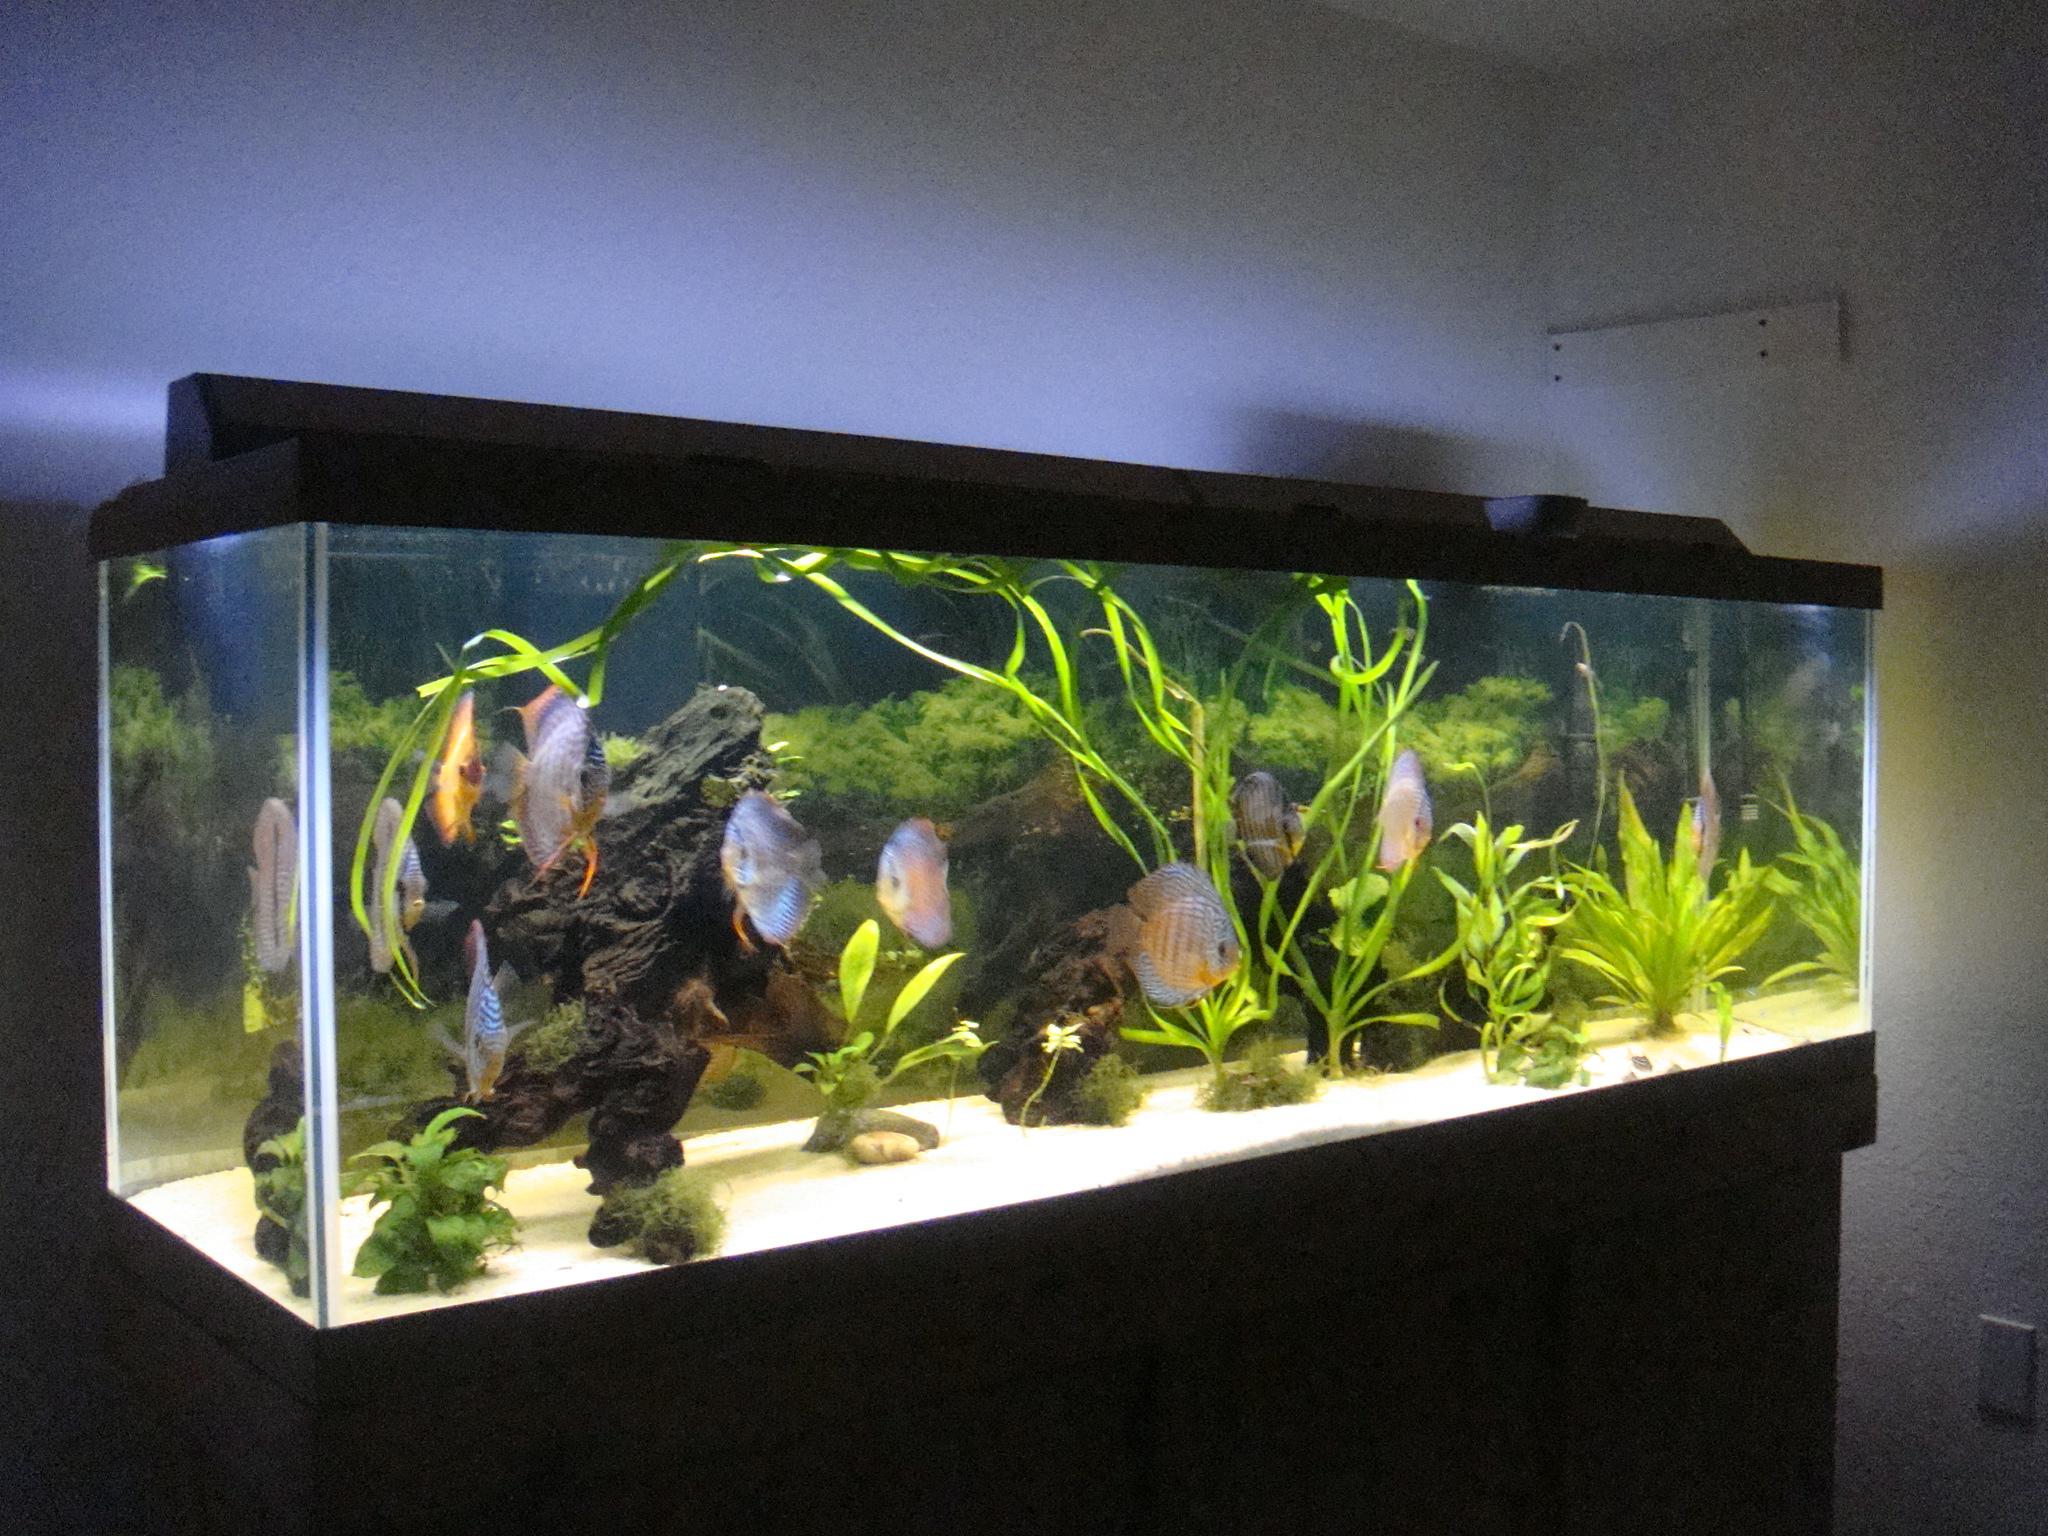 discus fish 20 gallon tank - cichlids.com: 150 gallon Discus tank at LFS 2017 - Fish Tank ...